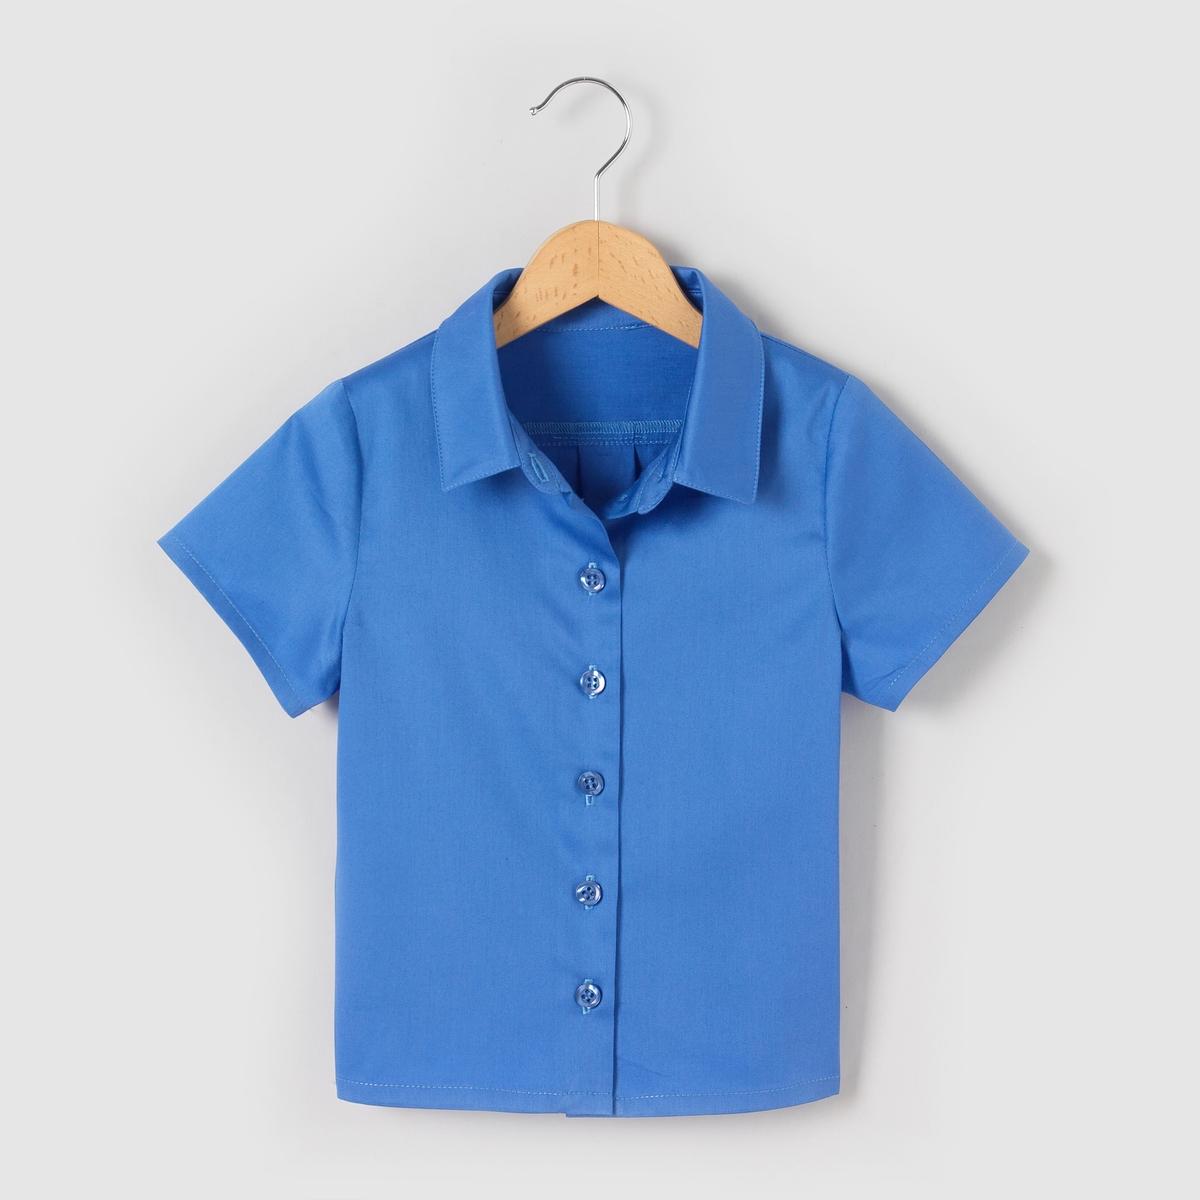 Рубашка с короткими рукавами для 3-12 лет от La Redoute Collections